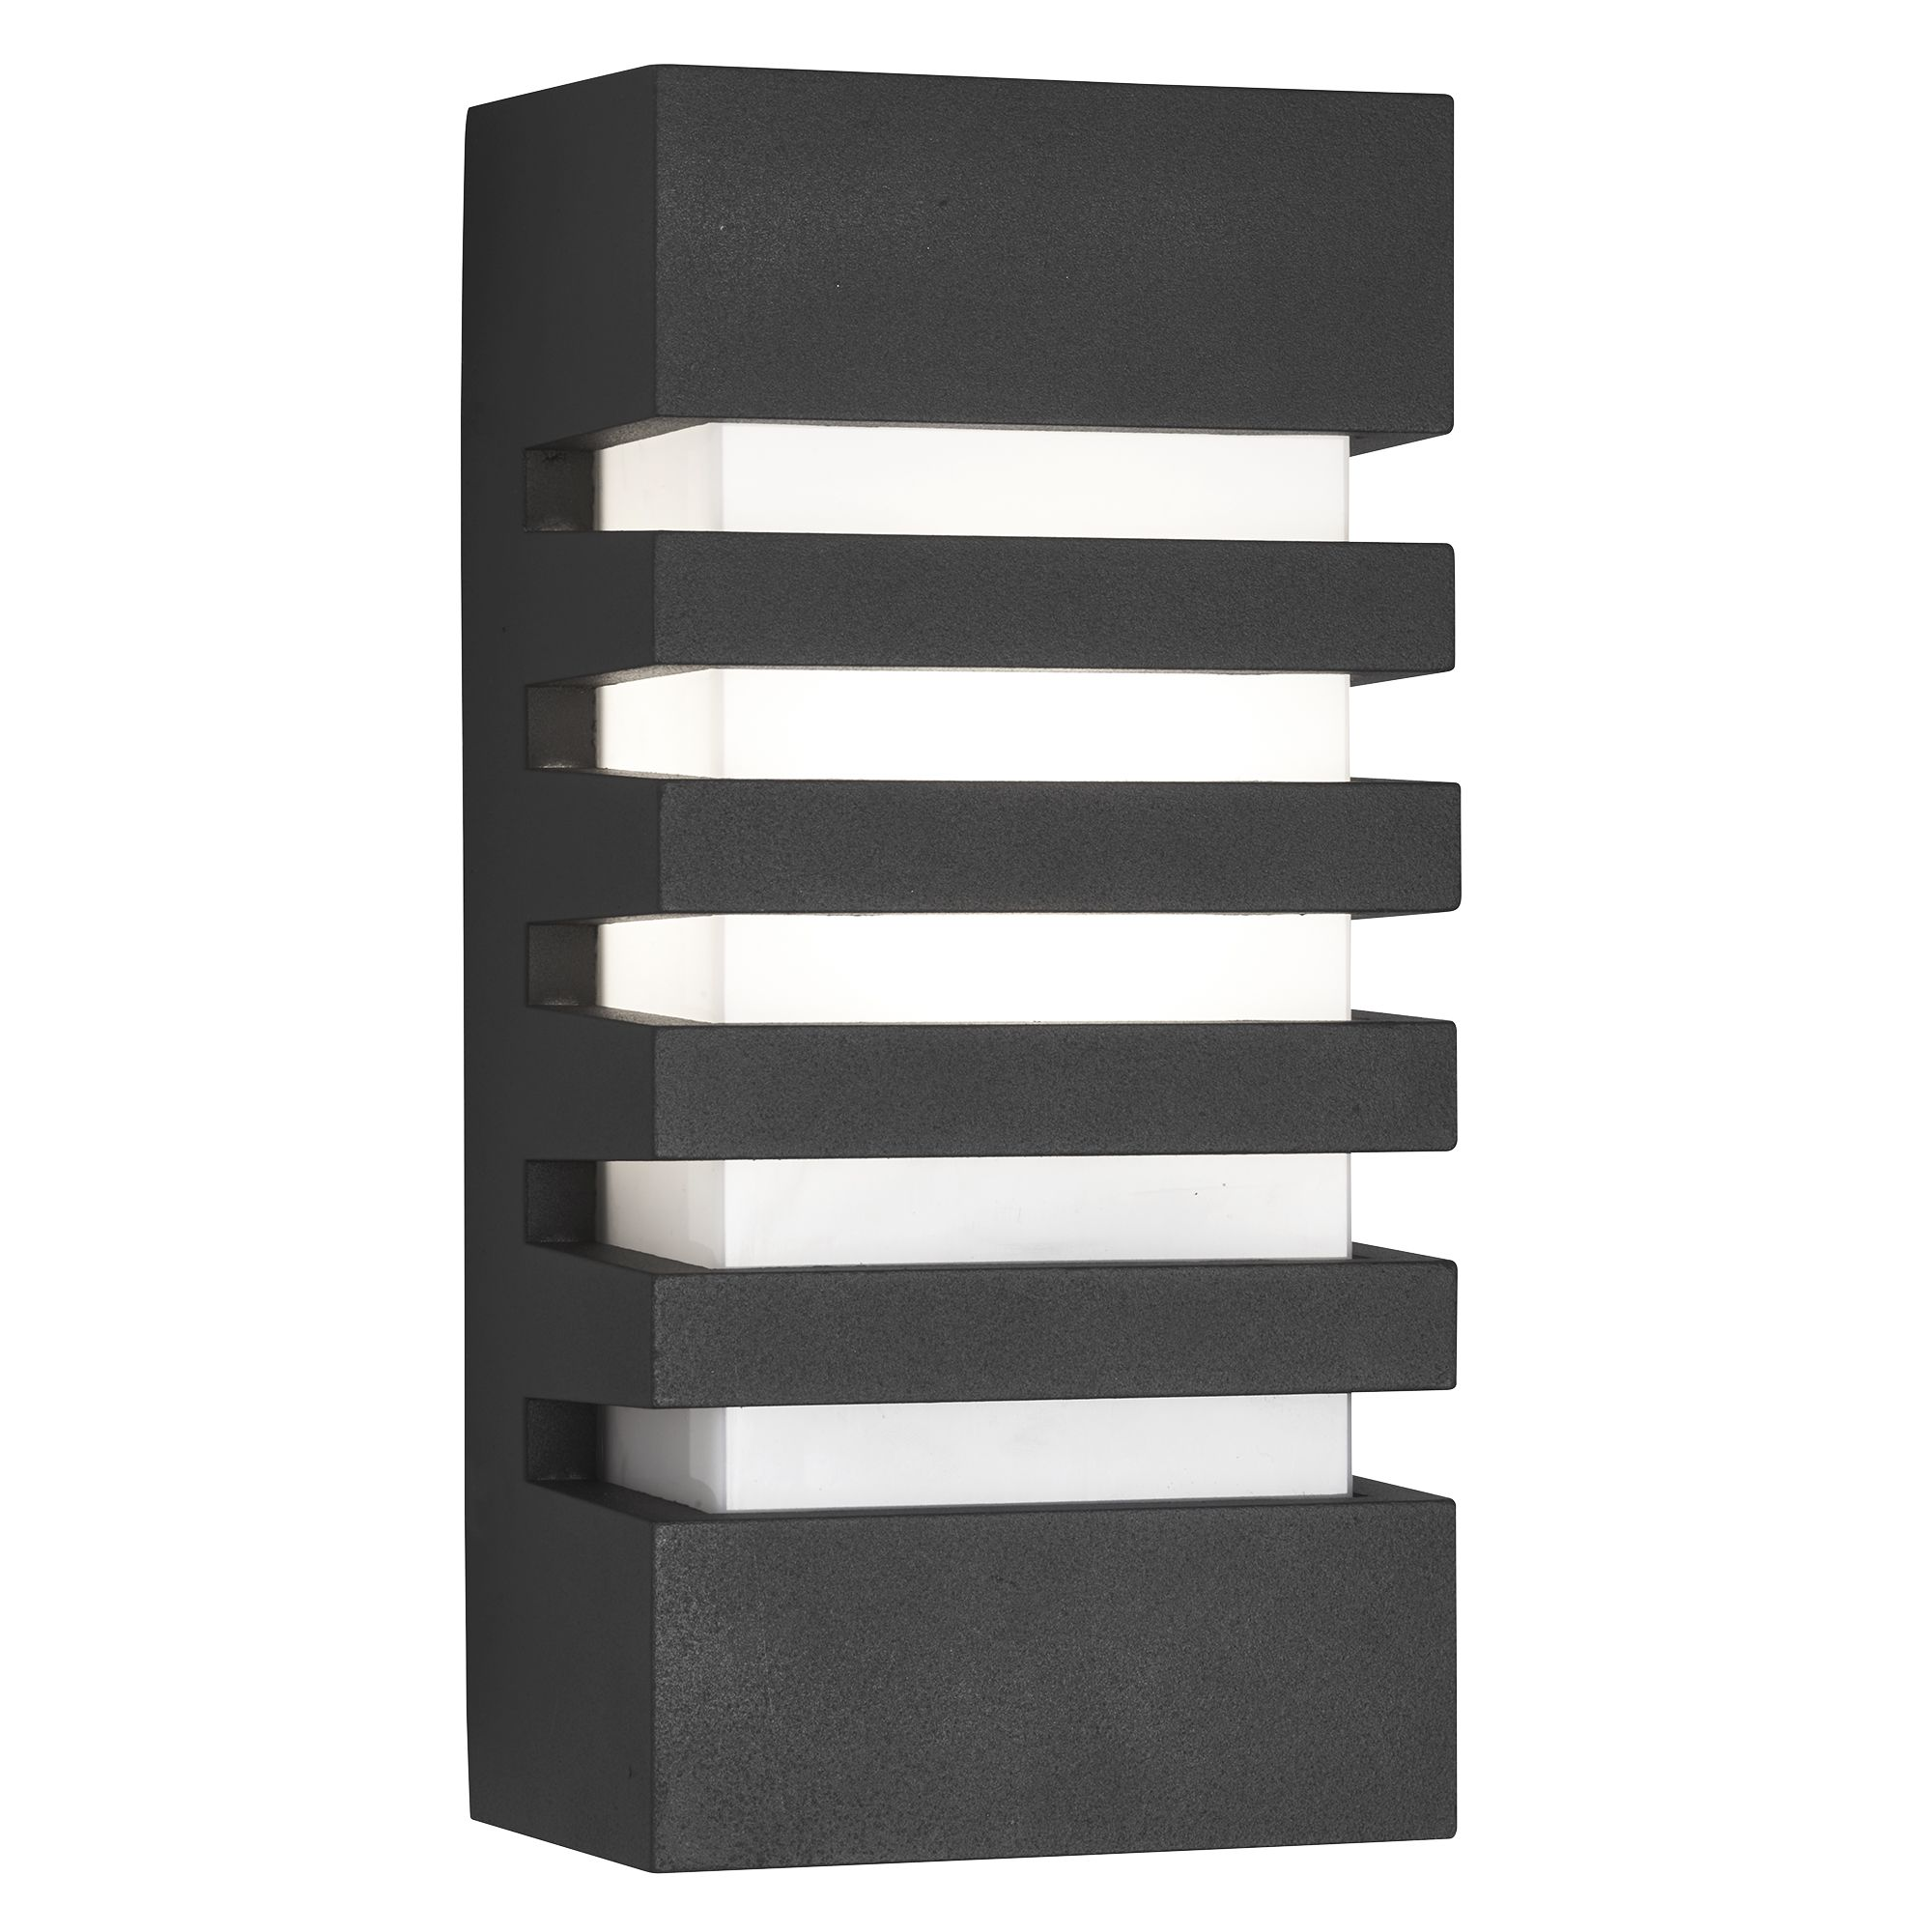 Aluminium Ip44 Grilled Dark Grey Outdoor Wall Light, Polycarbonate Opal Shade